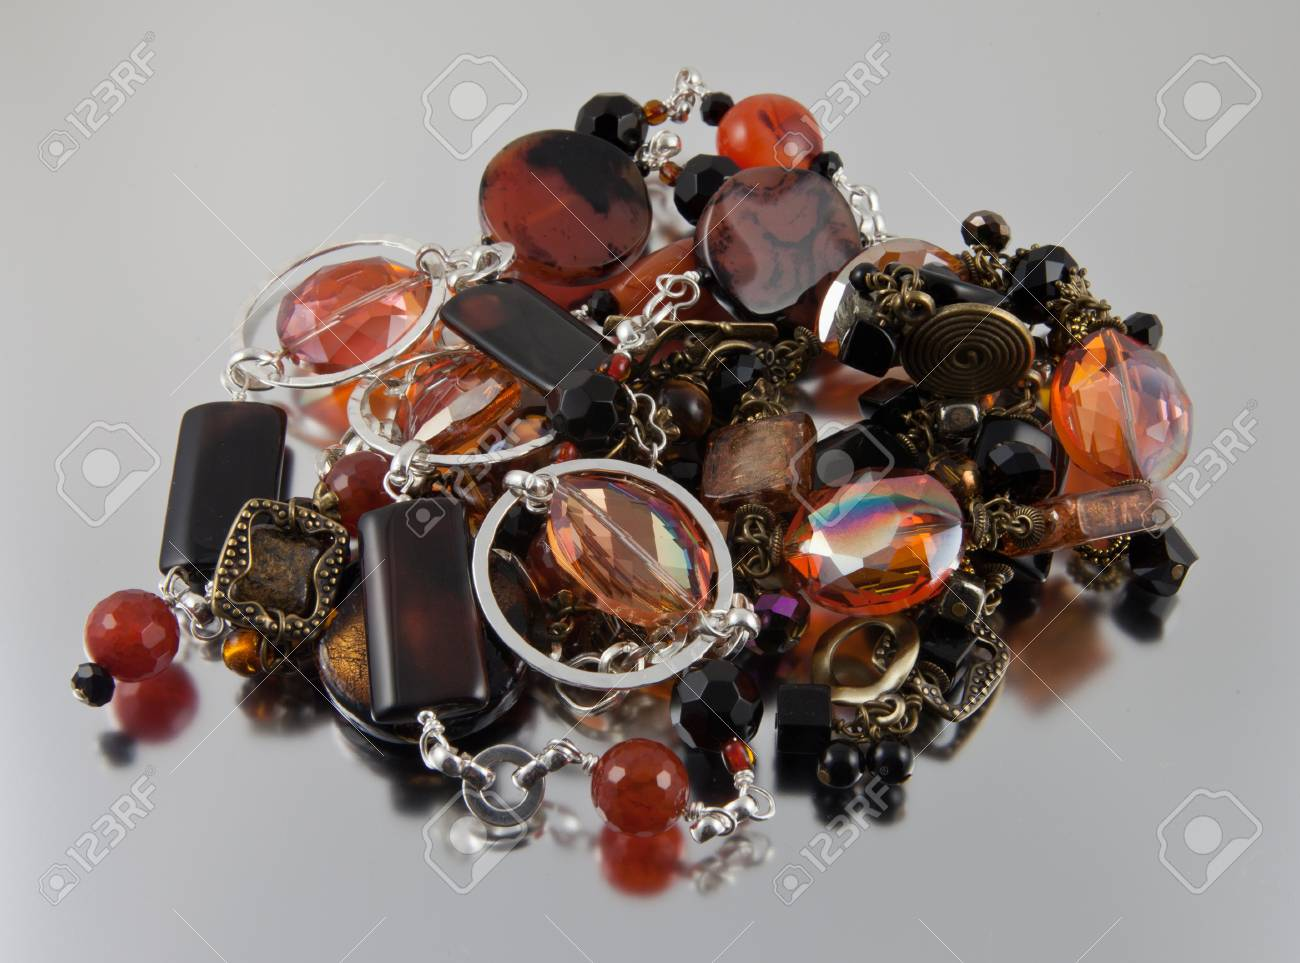 Semi precious gems in a jewelry pile Stock Photo - 13678206